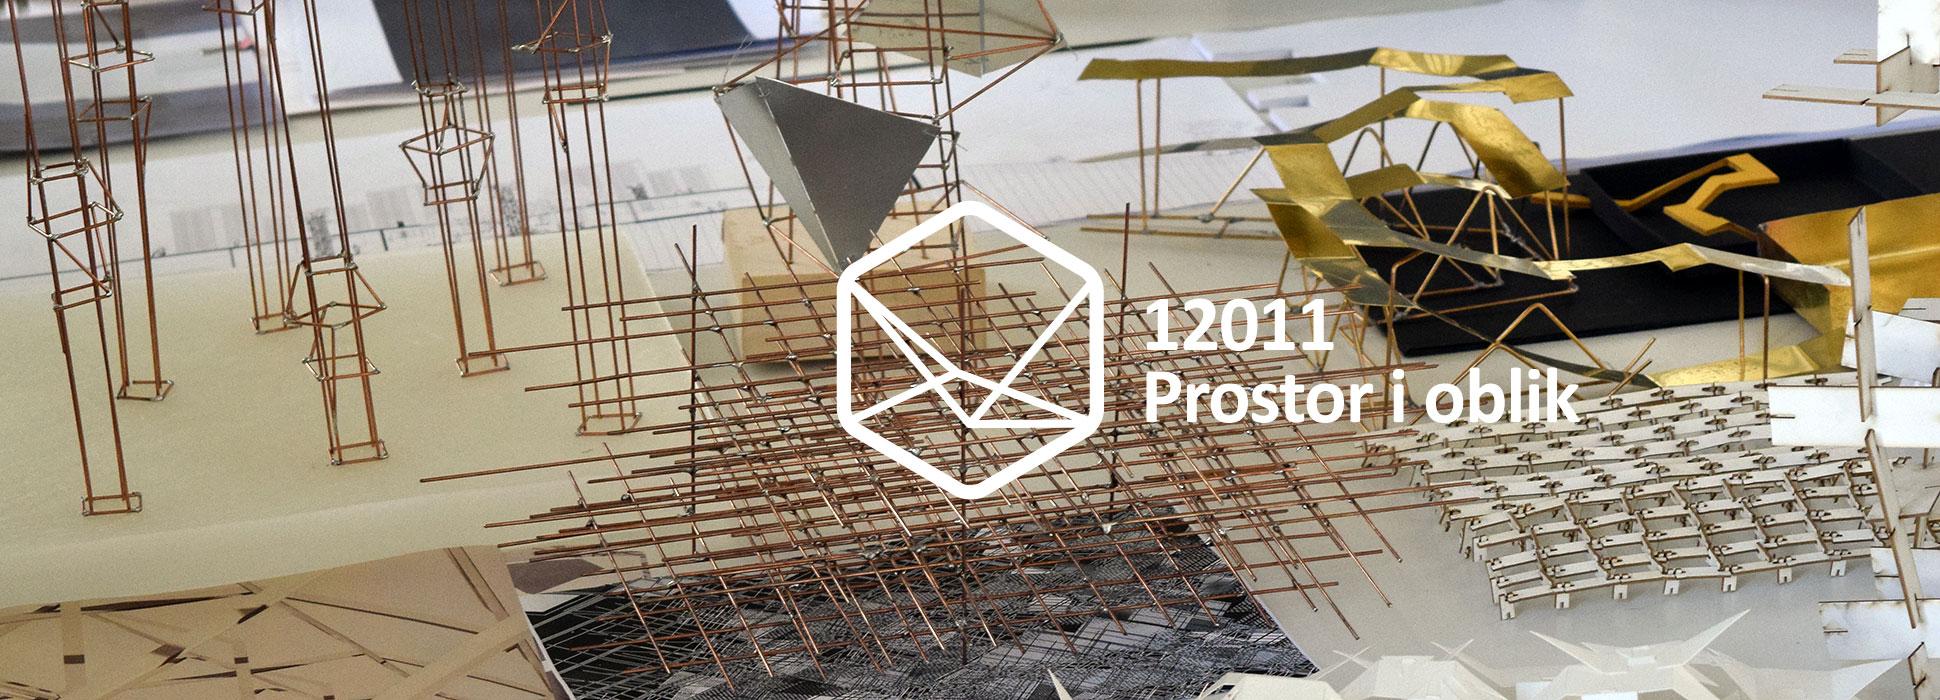 201617_OASA-IASA-12011_Prostor-i-oblik_cover